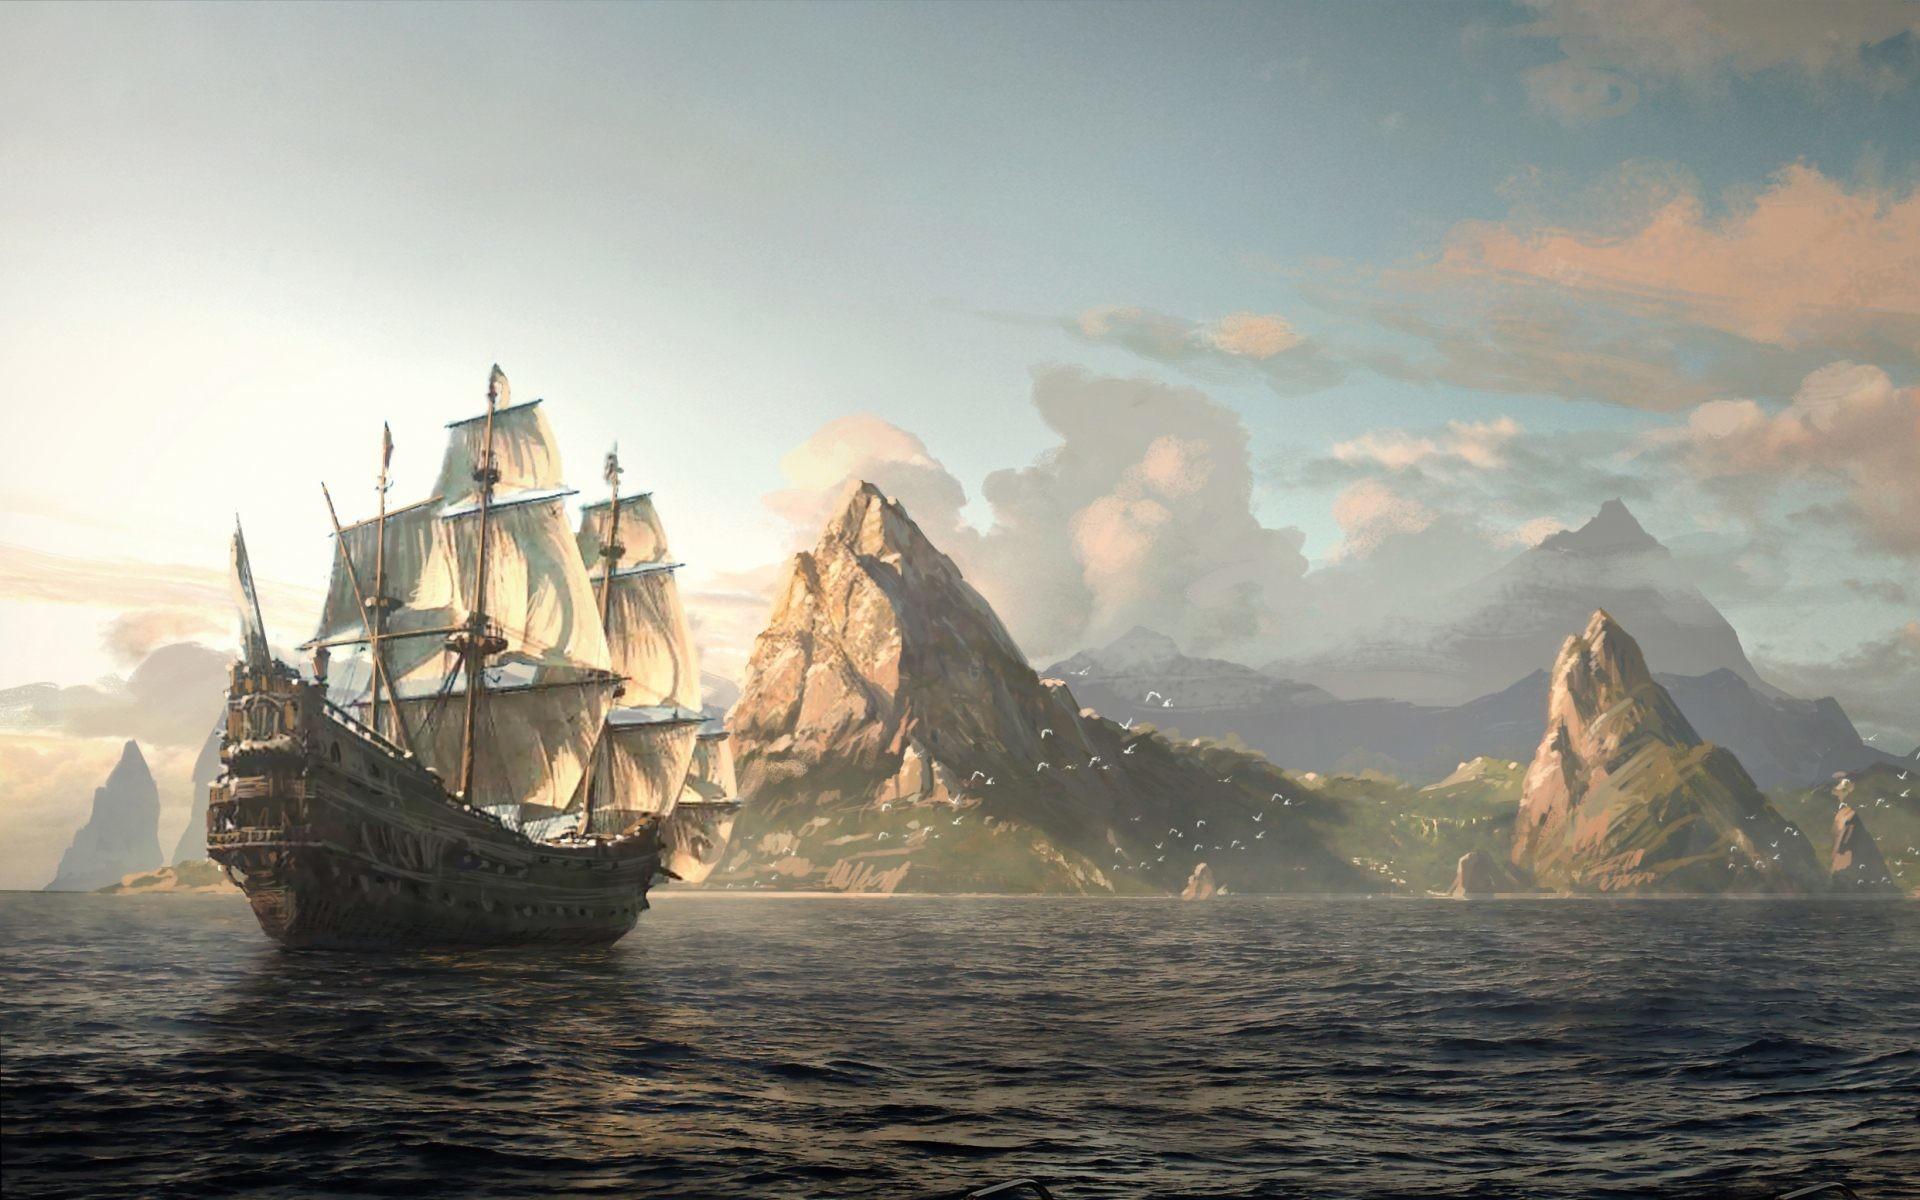 Pirate Ship Wallpaper Free ~ Sdeerwallpaper